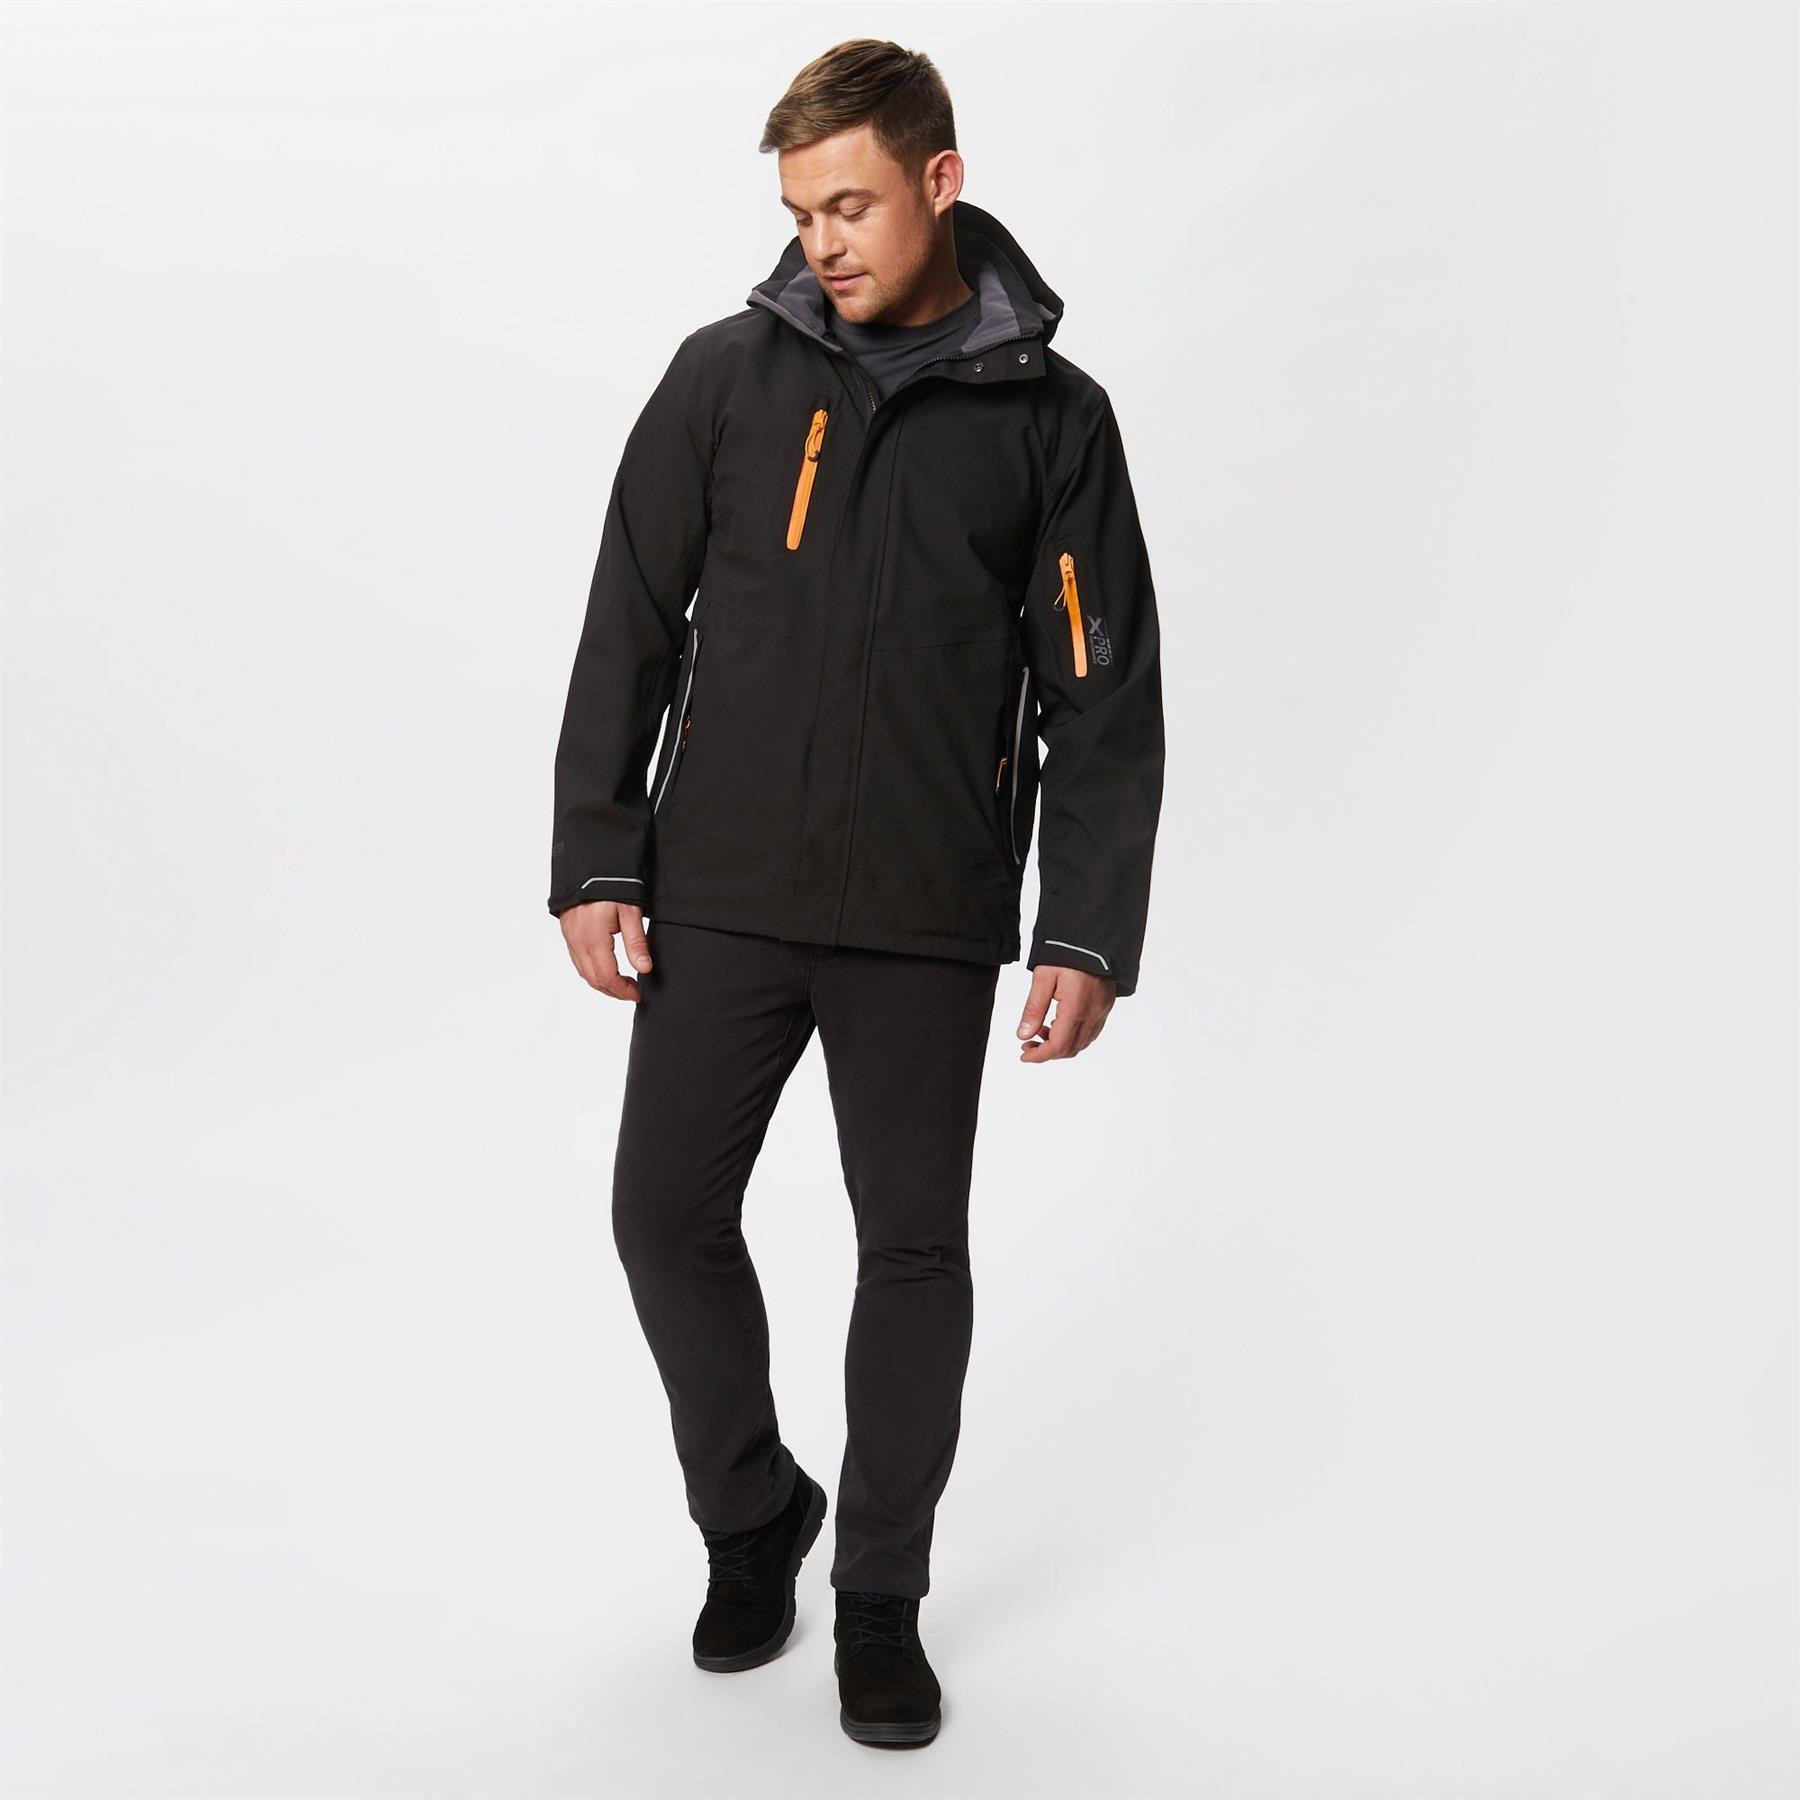 miniatuur 5 - Regatta Mens X-Pro Exosphere Stretch Waterproof Hooded Jacket